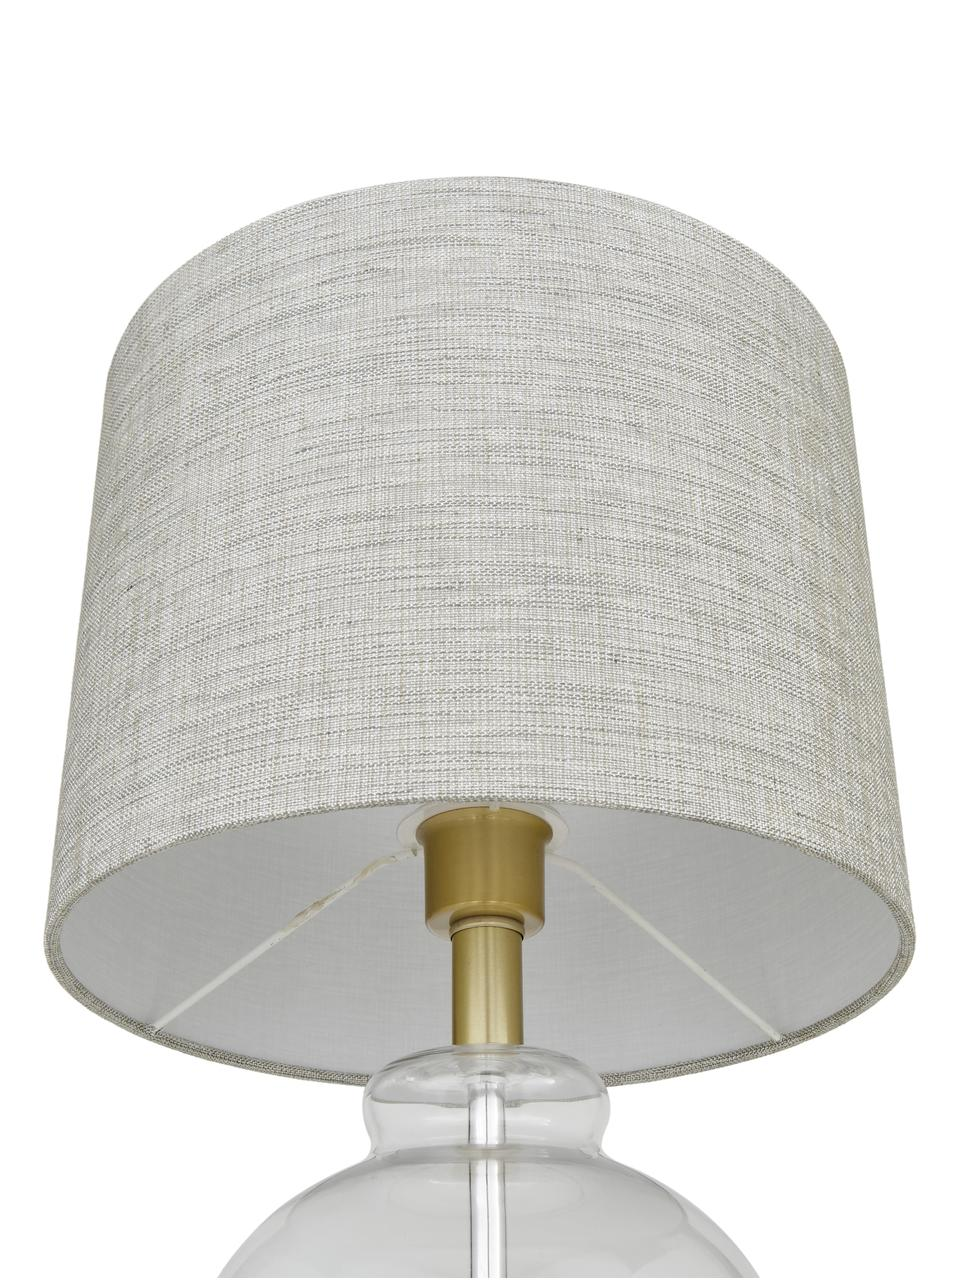 Tafellamp Natty met glazen onderstel, Lampenkap: textiel, Lampvoet: glas, Voetstuk: geborsteld messing, Taupe, transparant, Ø 31 x H 48 cm